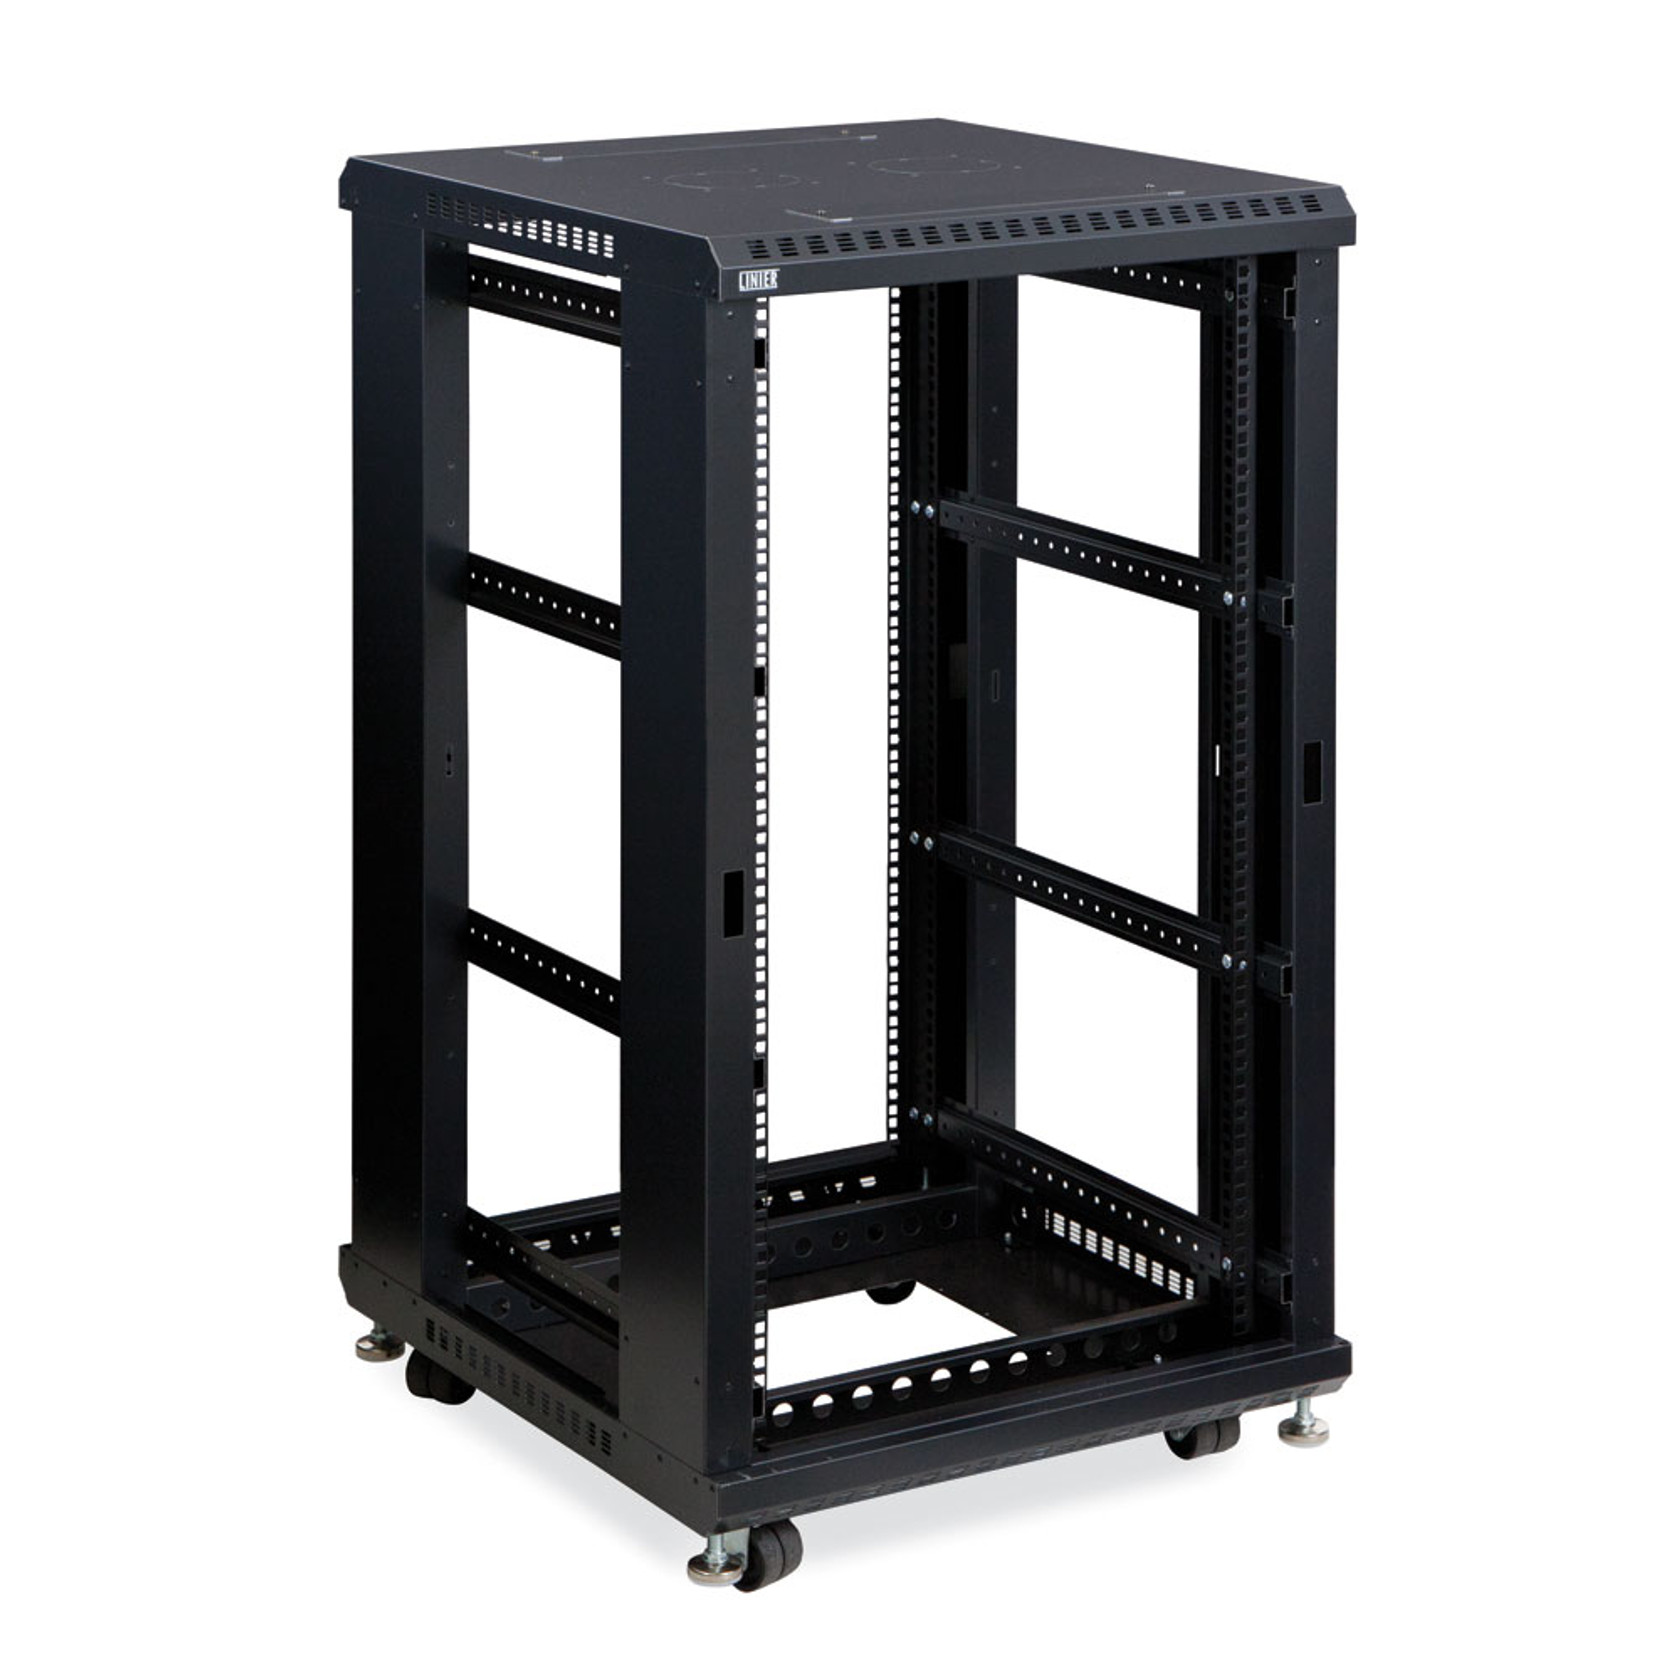 22U LINIER Server Cabinet Open Frame No Doors 24  Depth 19u201d Rack  sc 1 st  Gaw Technology & KENDALL HOWARD u0026reg; | 4-Post Open Frame Server Racks | GAW Technologies